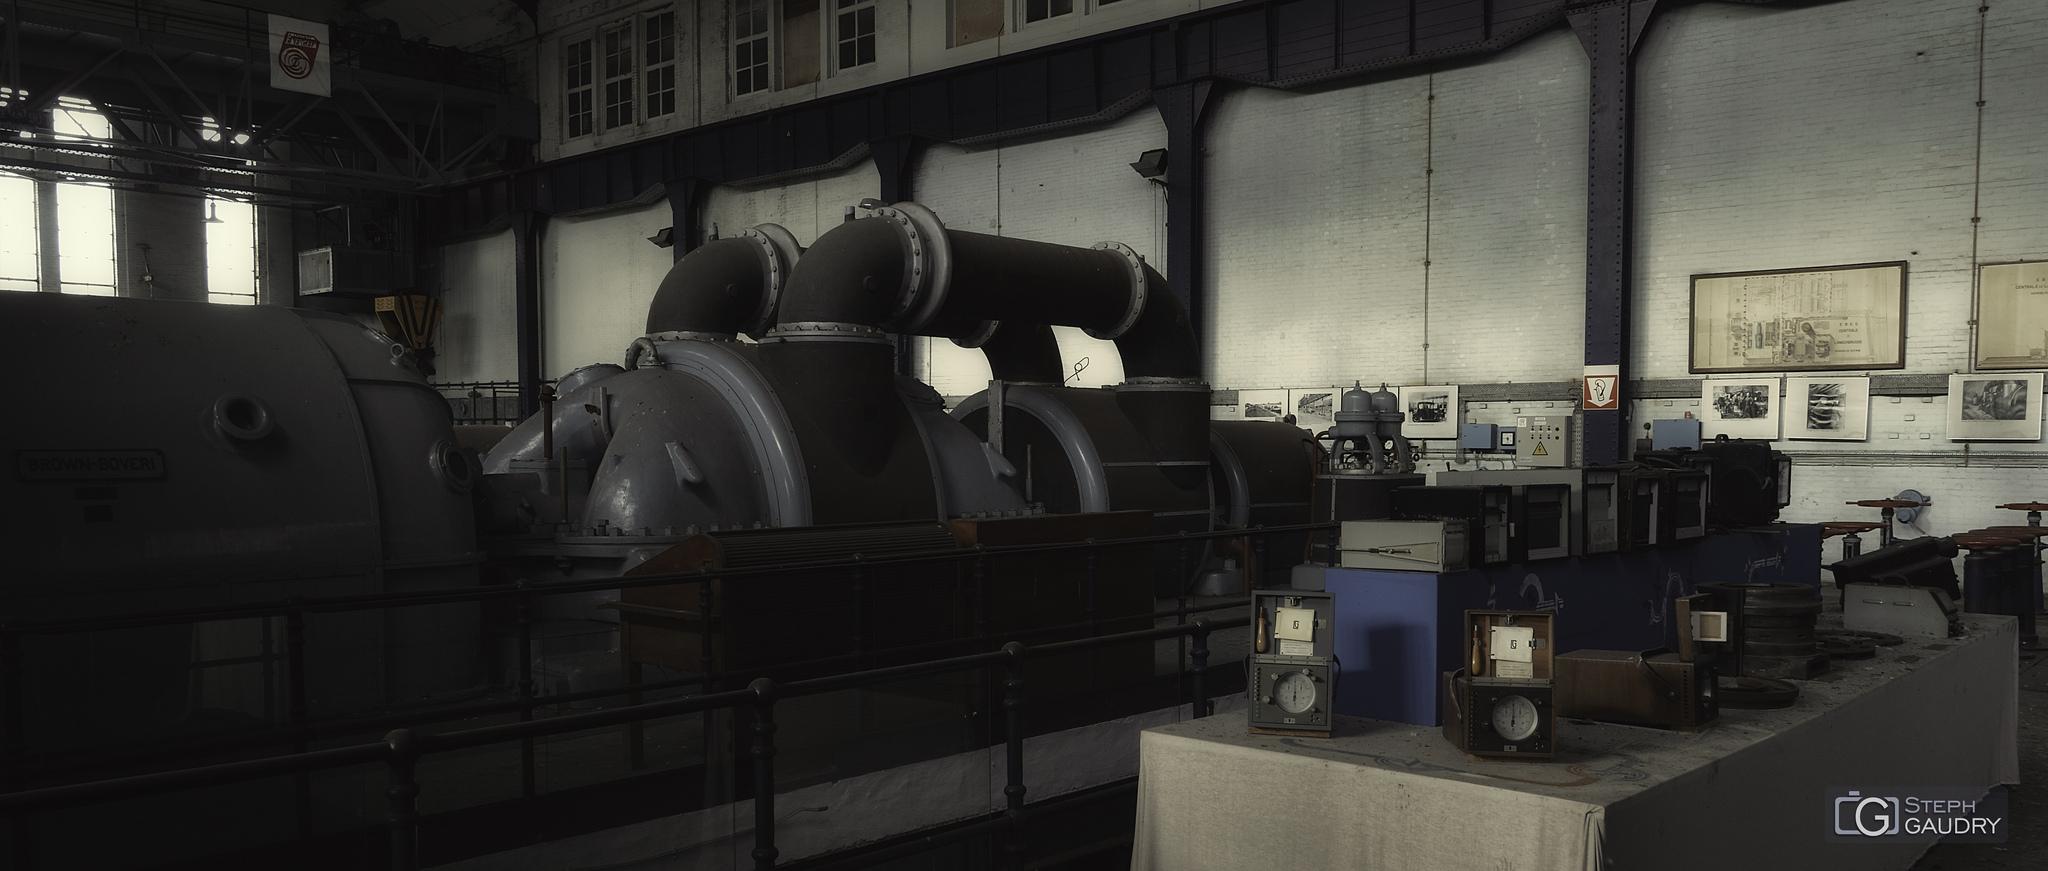 ECVB - EnergeiA - 3 [Click to start slideshow]